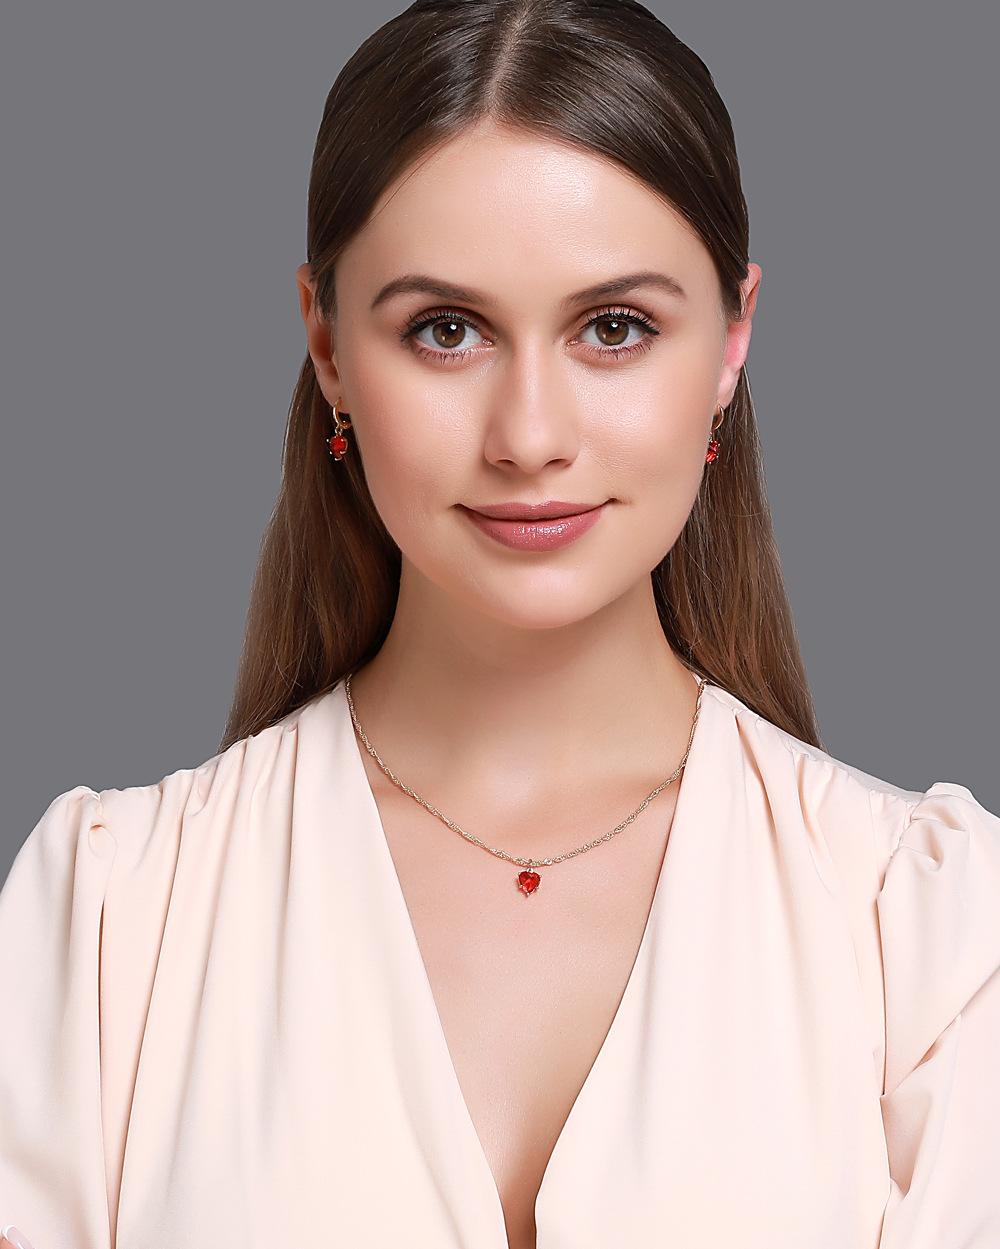 new suit jewelry classic crystal zircon love necklace earring ladies temperament wild jewelry wholesale nihaojewelry NHMO219000